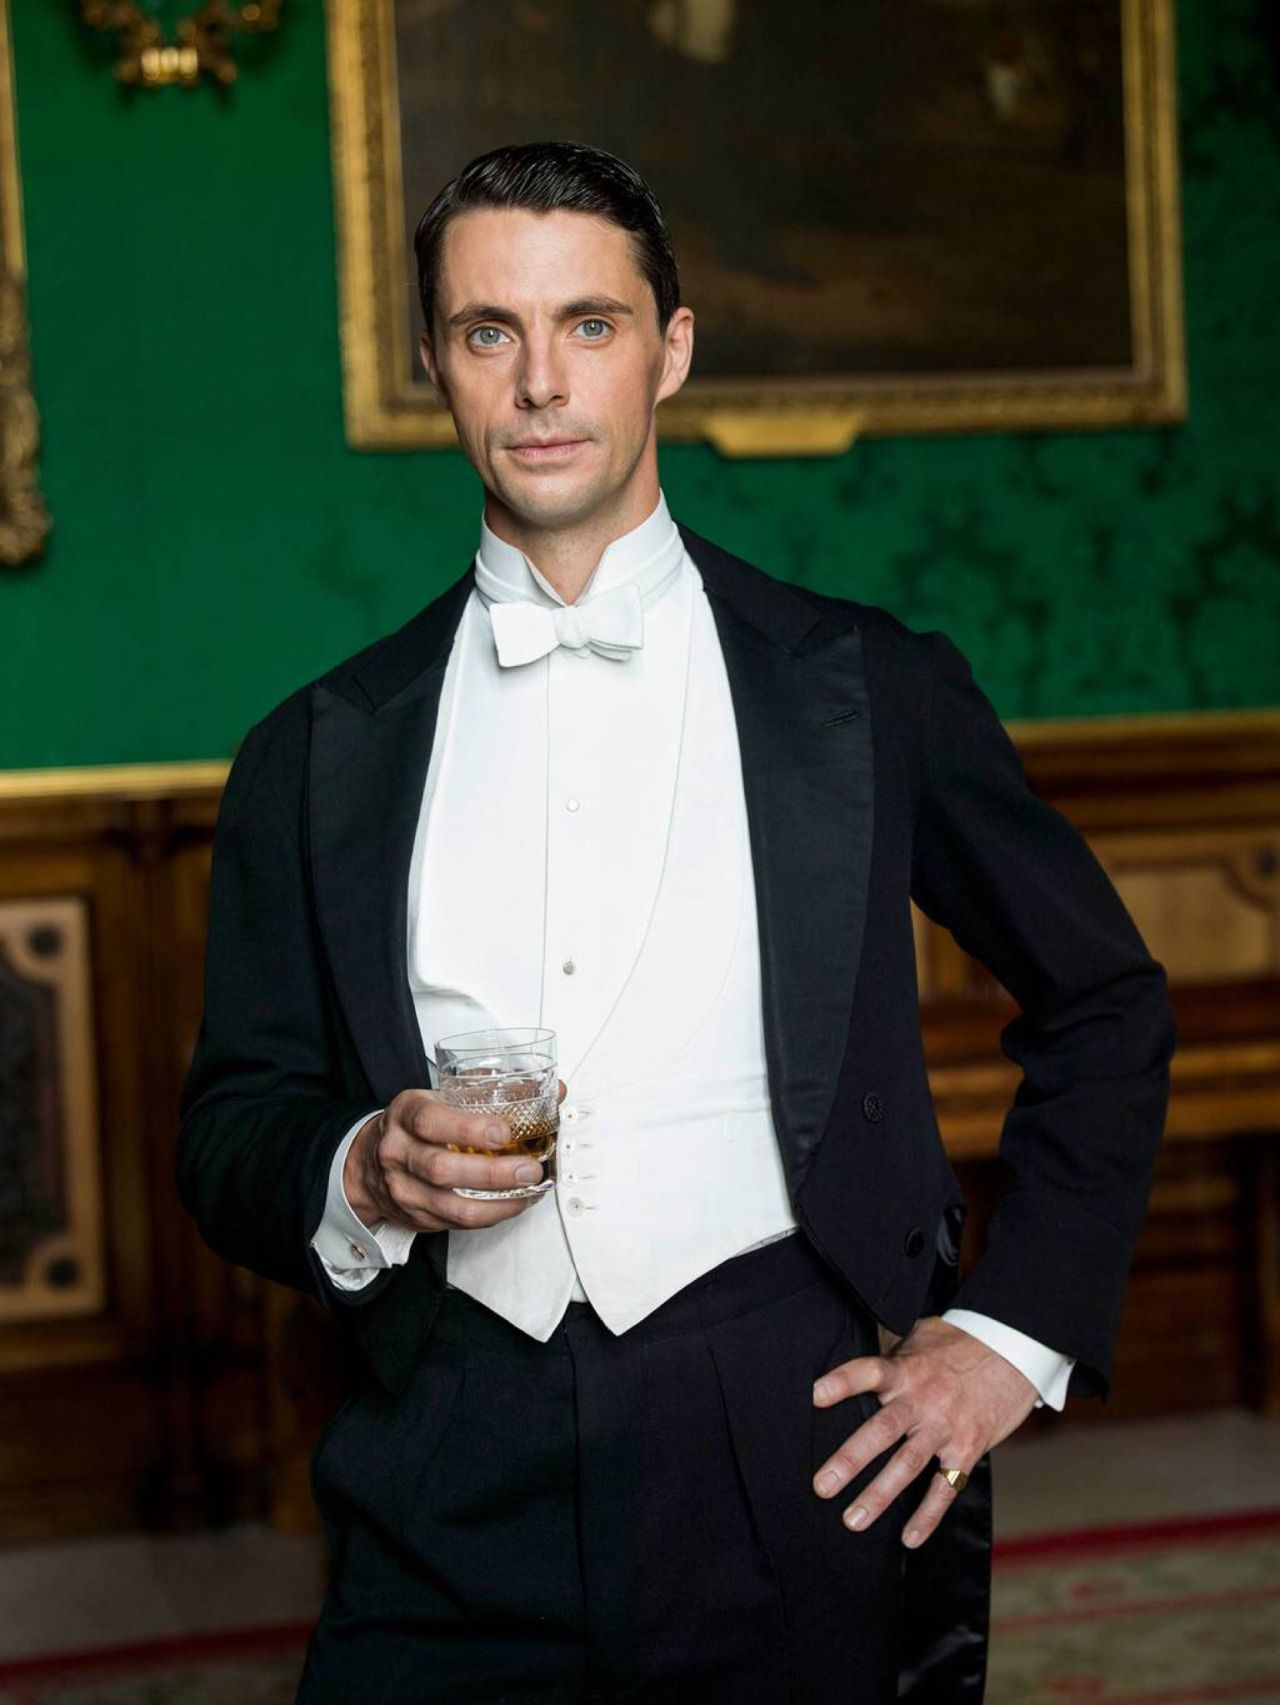 Henry Talbot Downton Abbey Downton Matthew Goode Downton Abbey